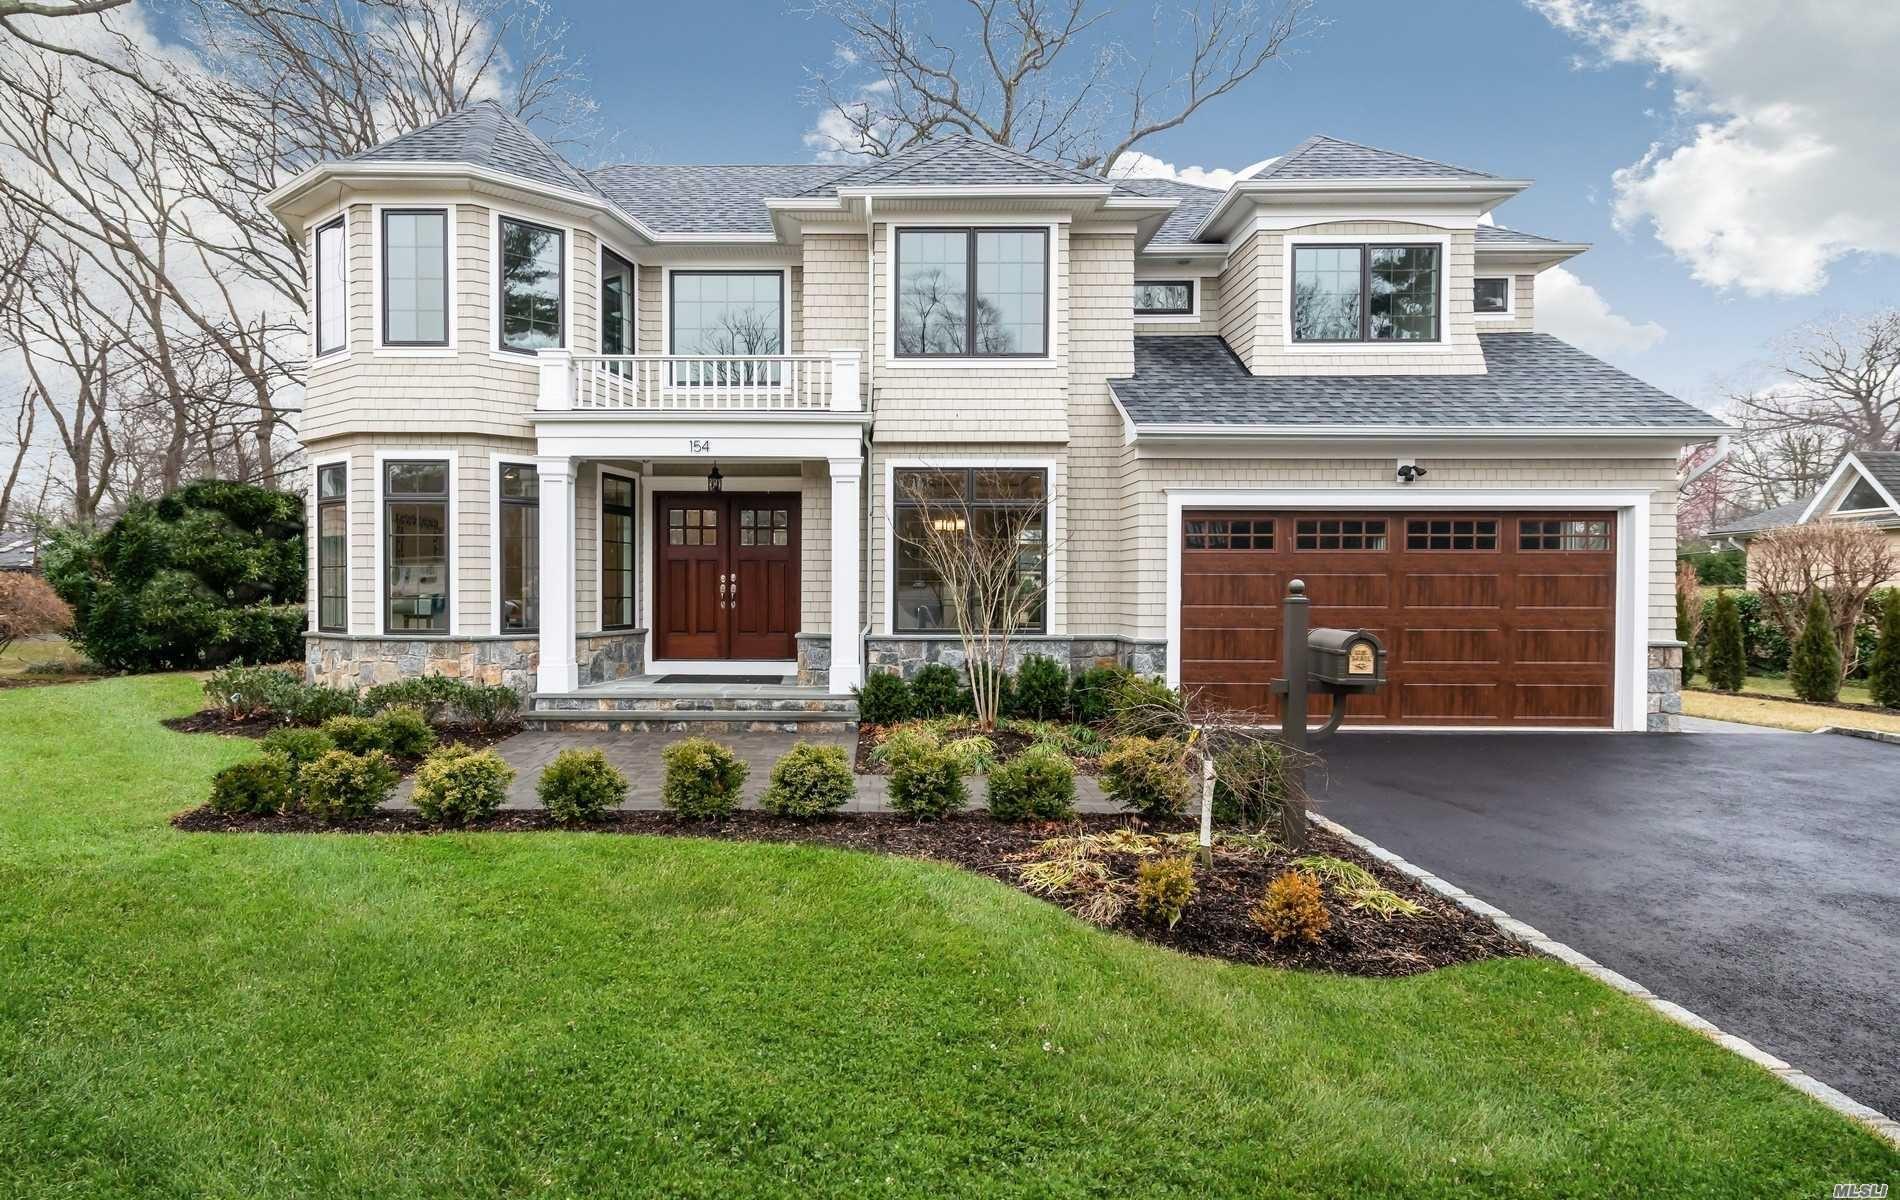 154 Crescent Lane, East Hills, NY 11577 - MLS#: 3199555